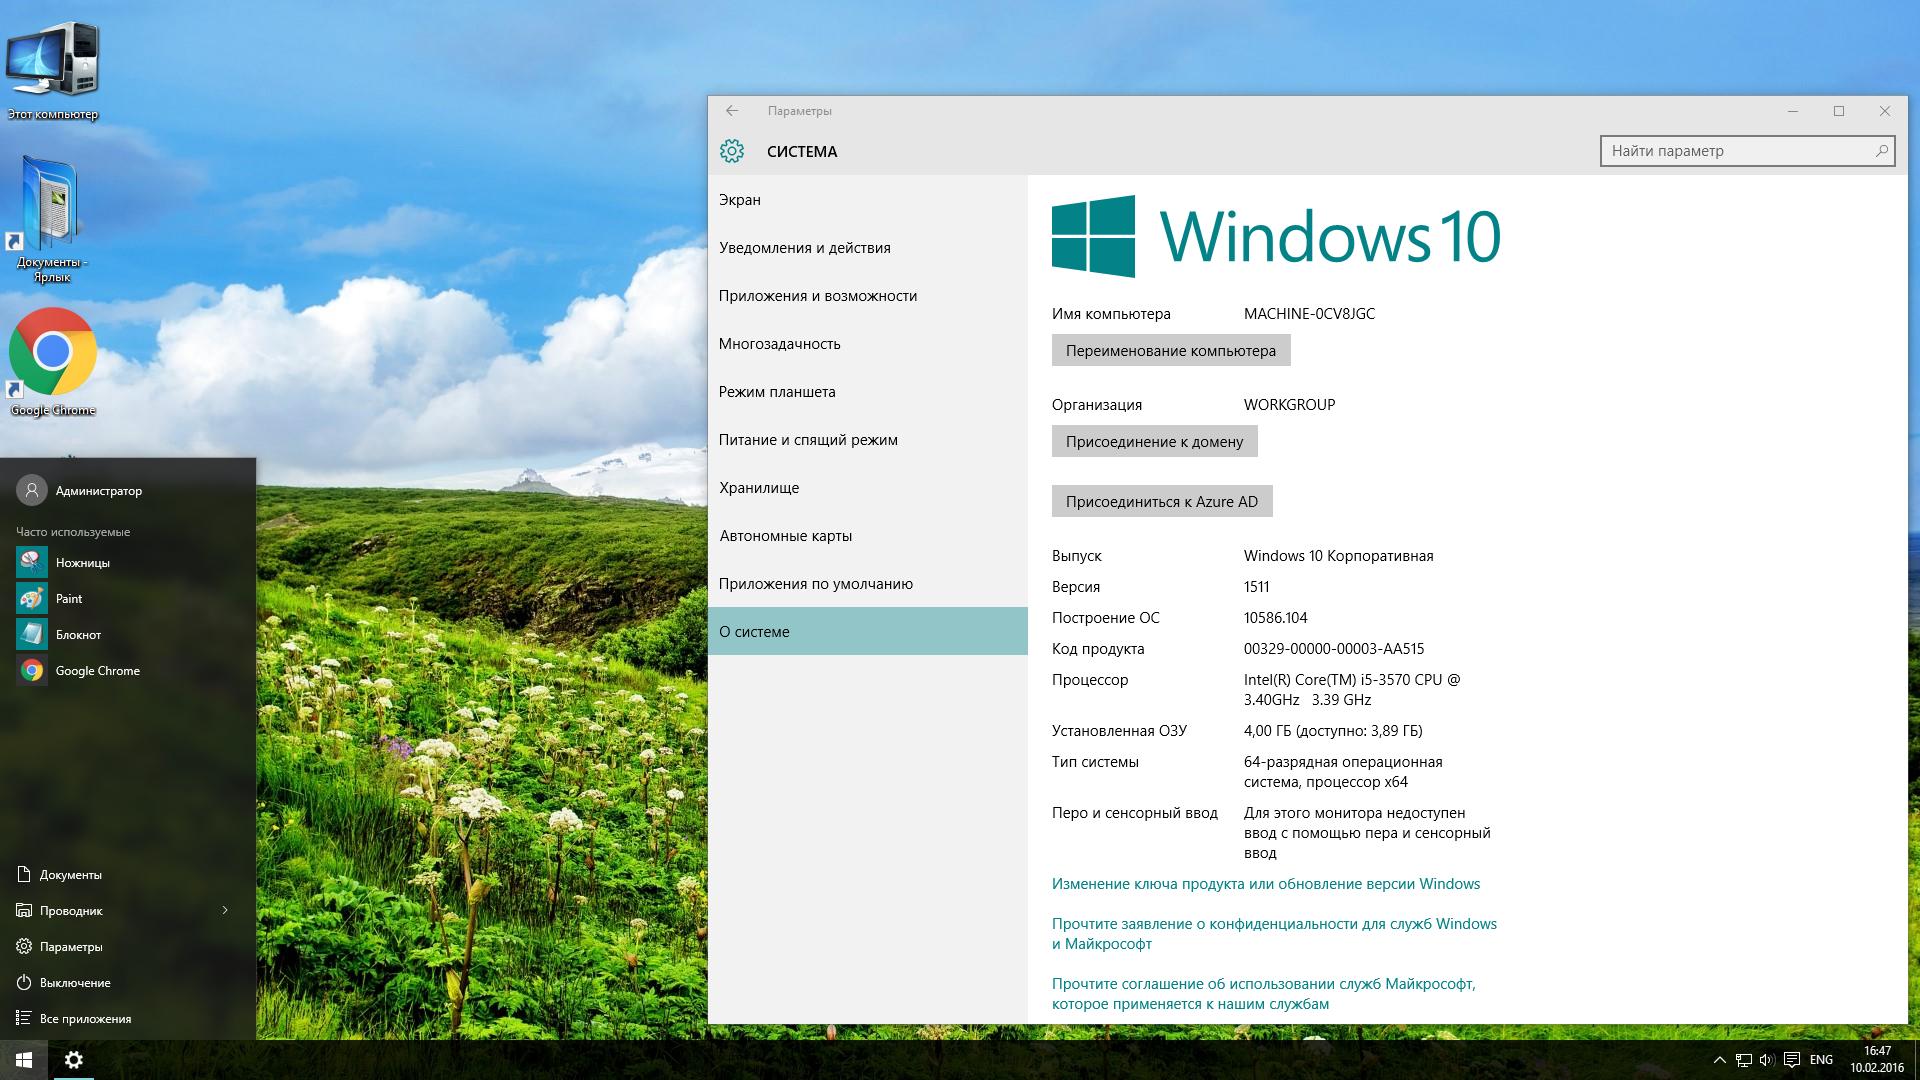 Cool Windows 10 Enterprise TH2 x64x86 RUS G M A  LTSB Style v 10 02 16